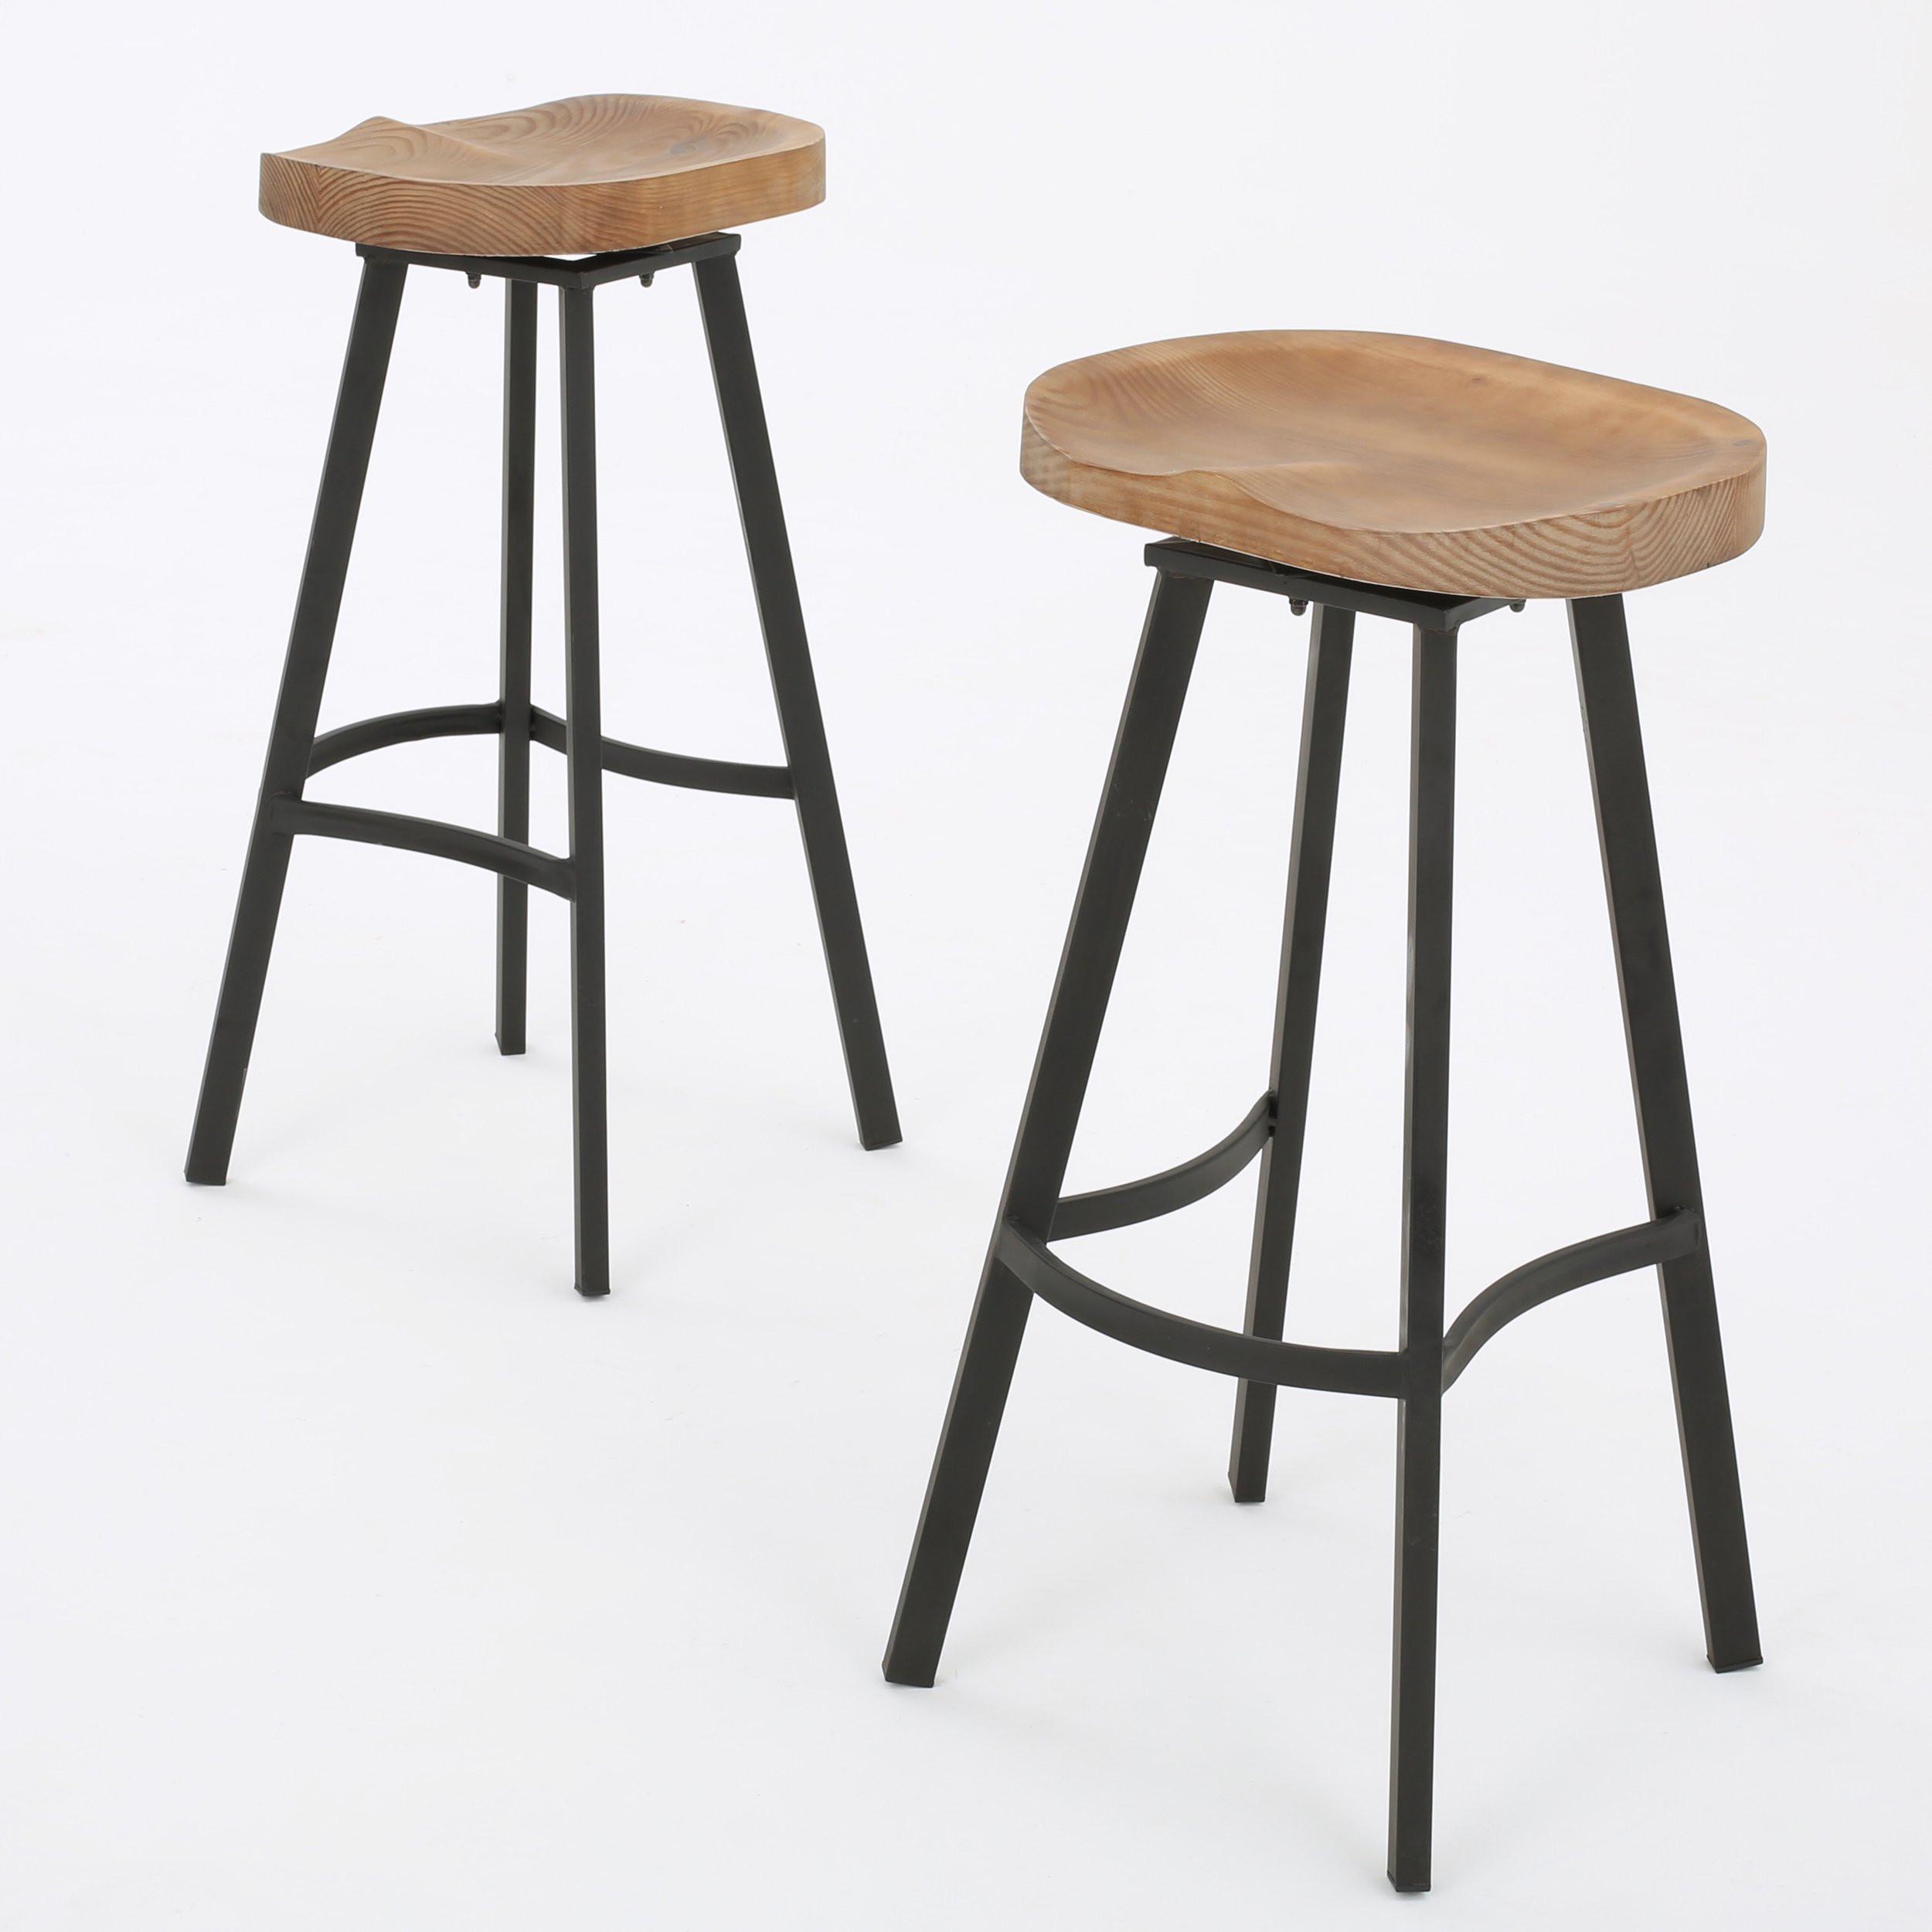 Shea wood and iron rustic Swivel Barstool (Set of...